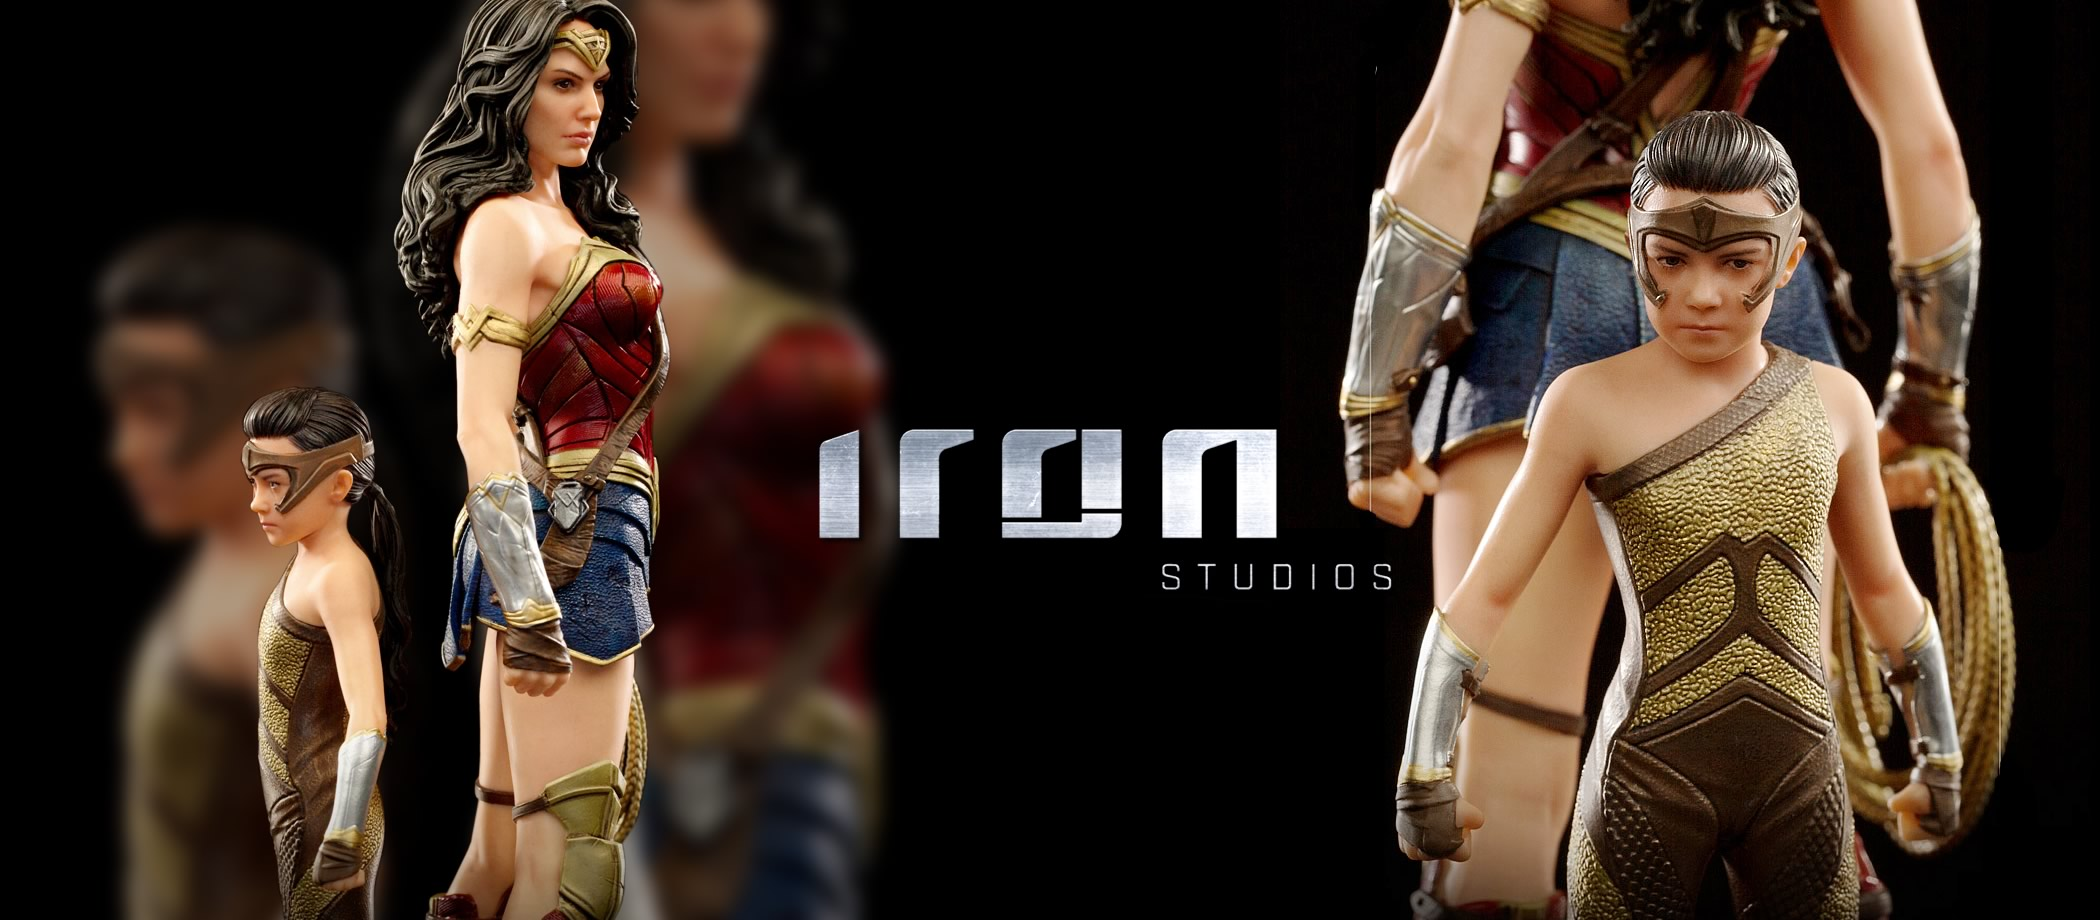 evolucao da wonder woman 84 by iron studios hero - A evolução da Wonder Woman by Iron Studios